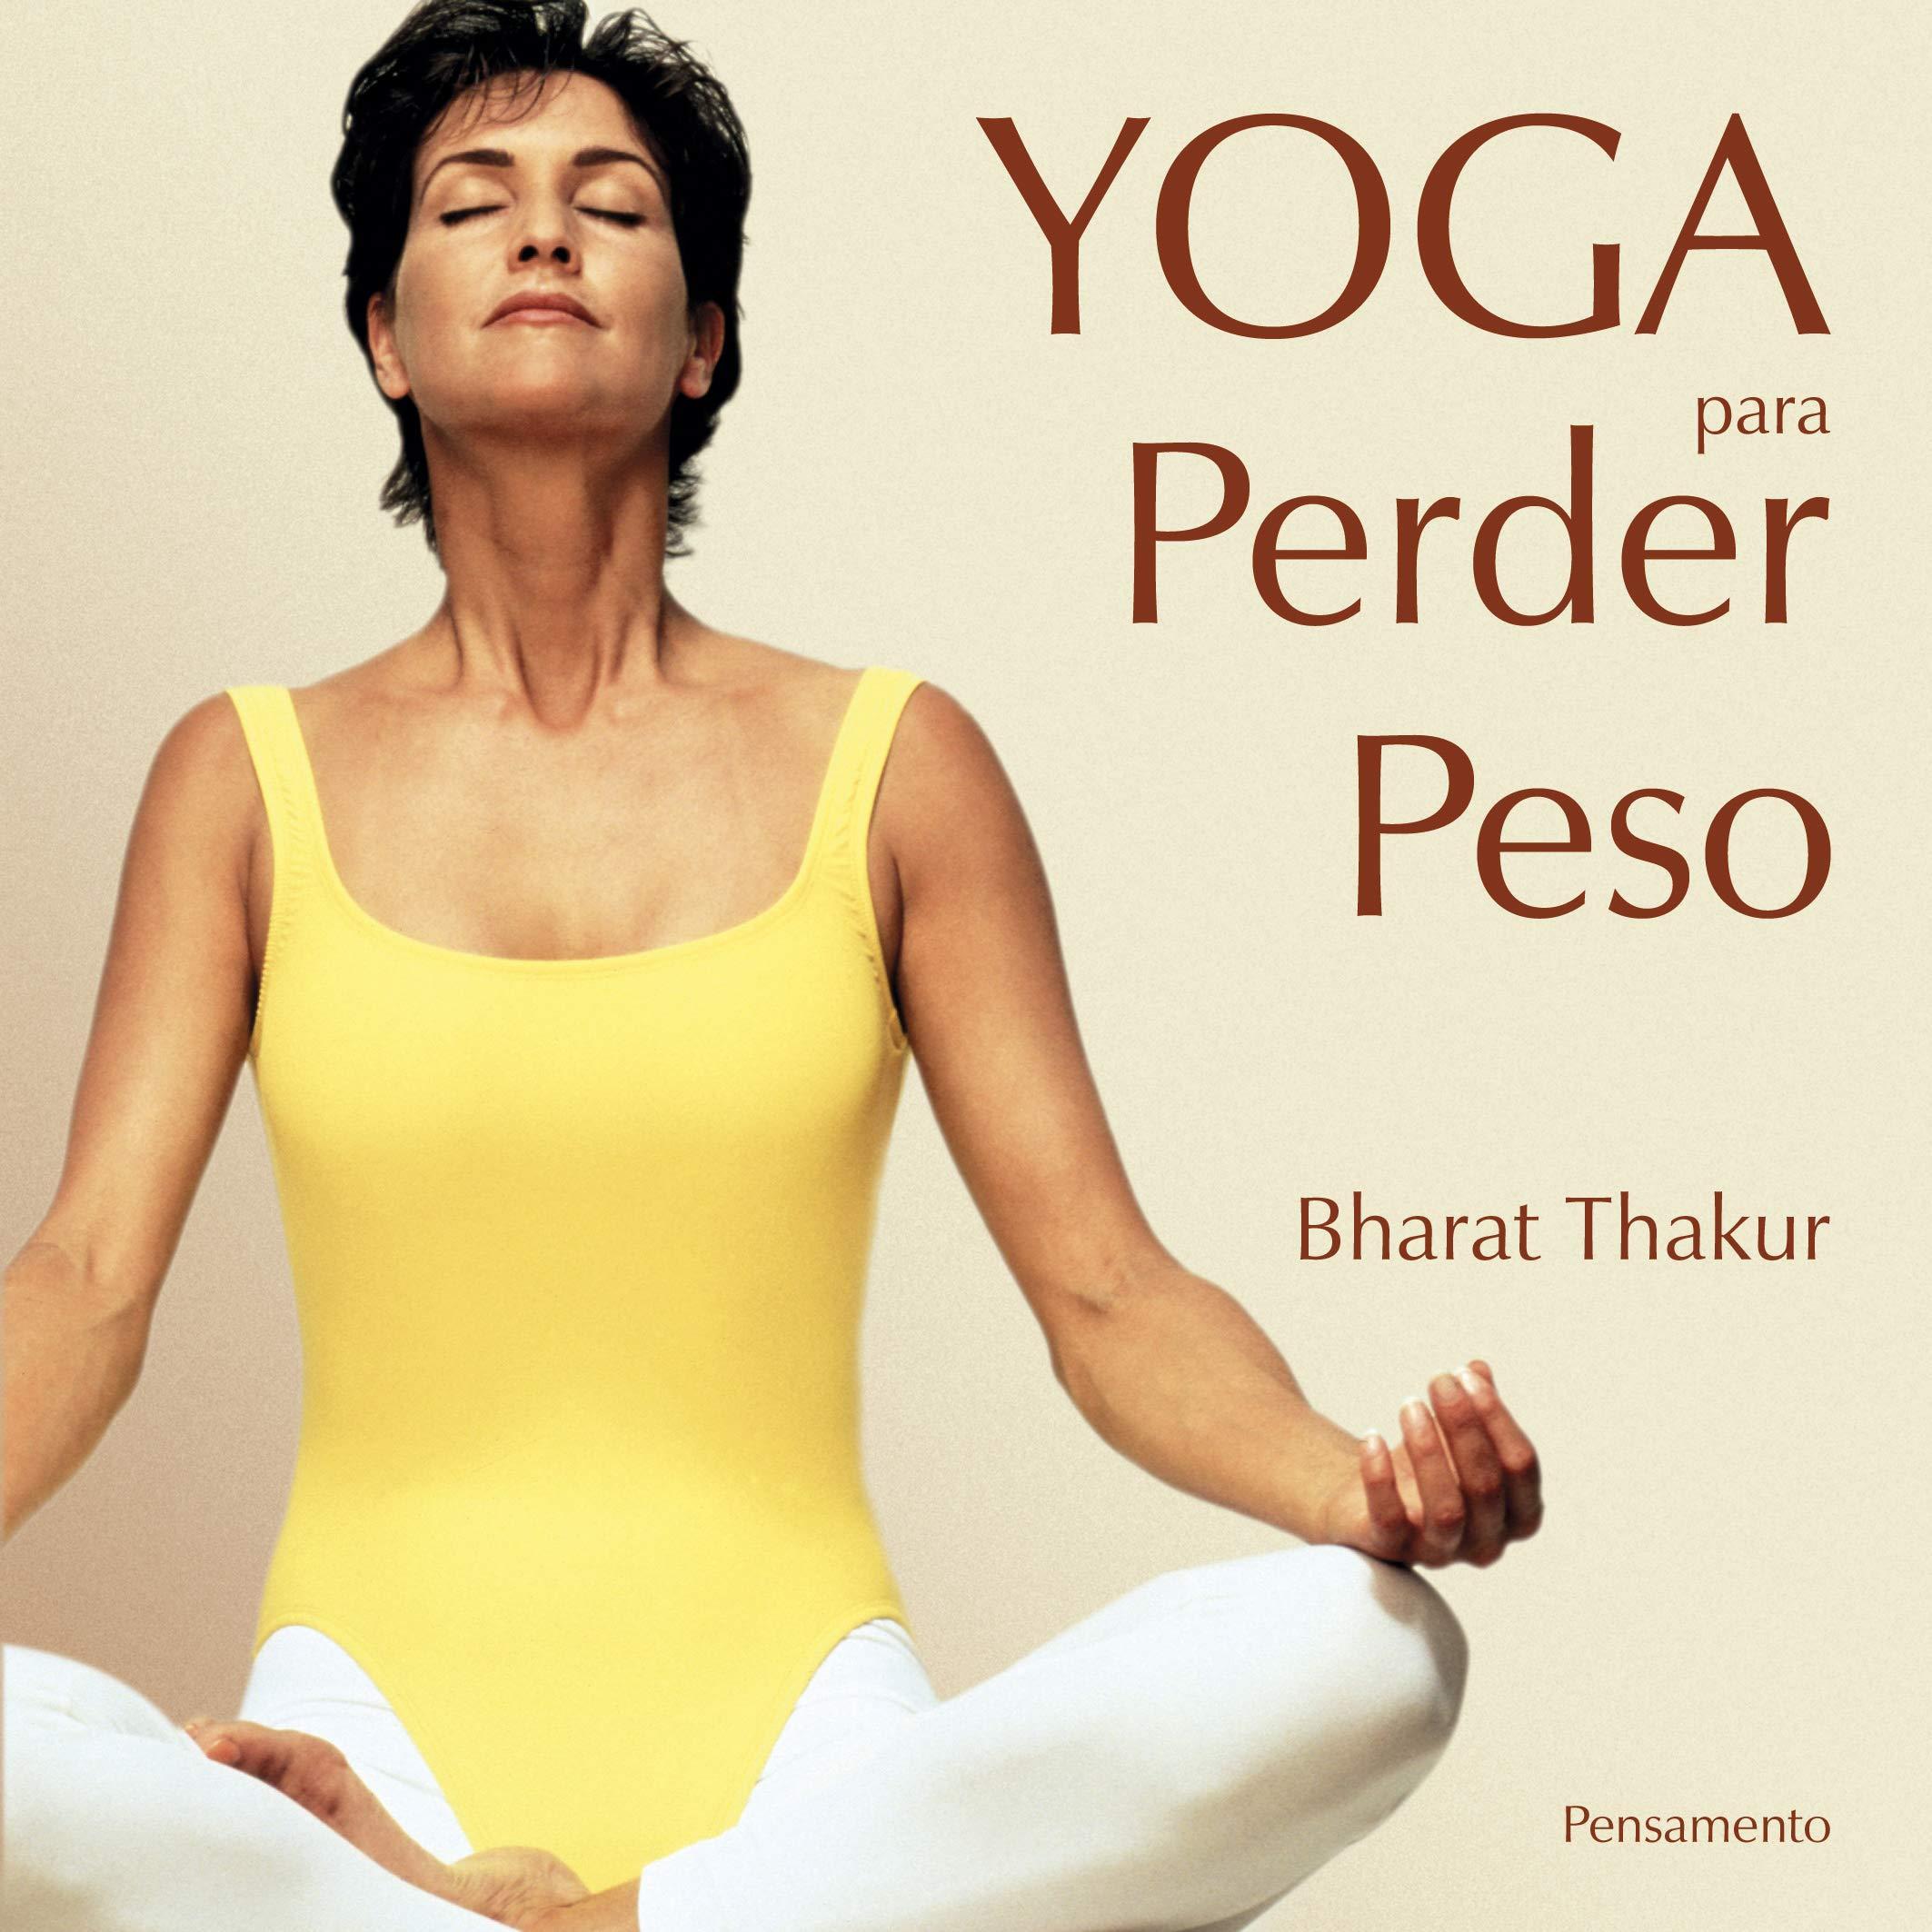 Yoga Para Perder Peso: Bharat Thakur: 9788531513534: Amazon ...